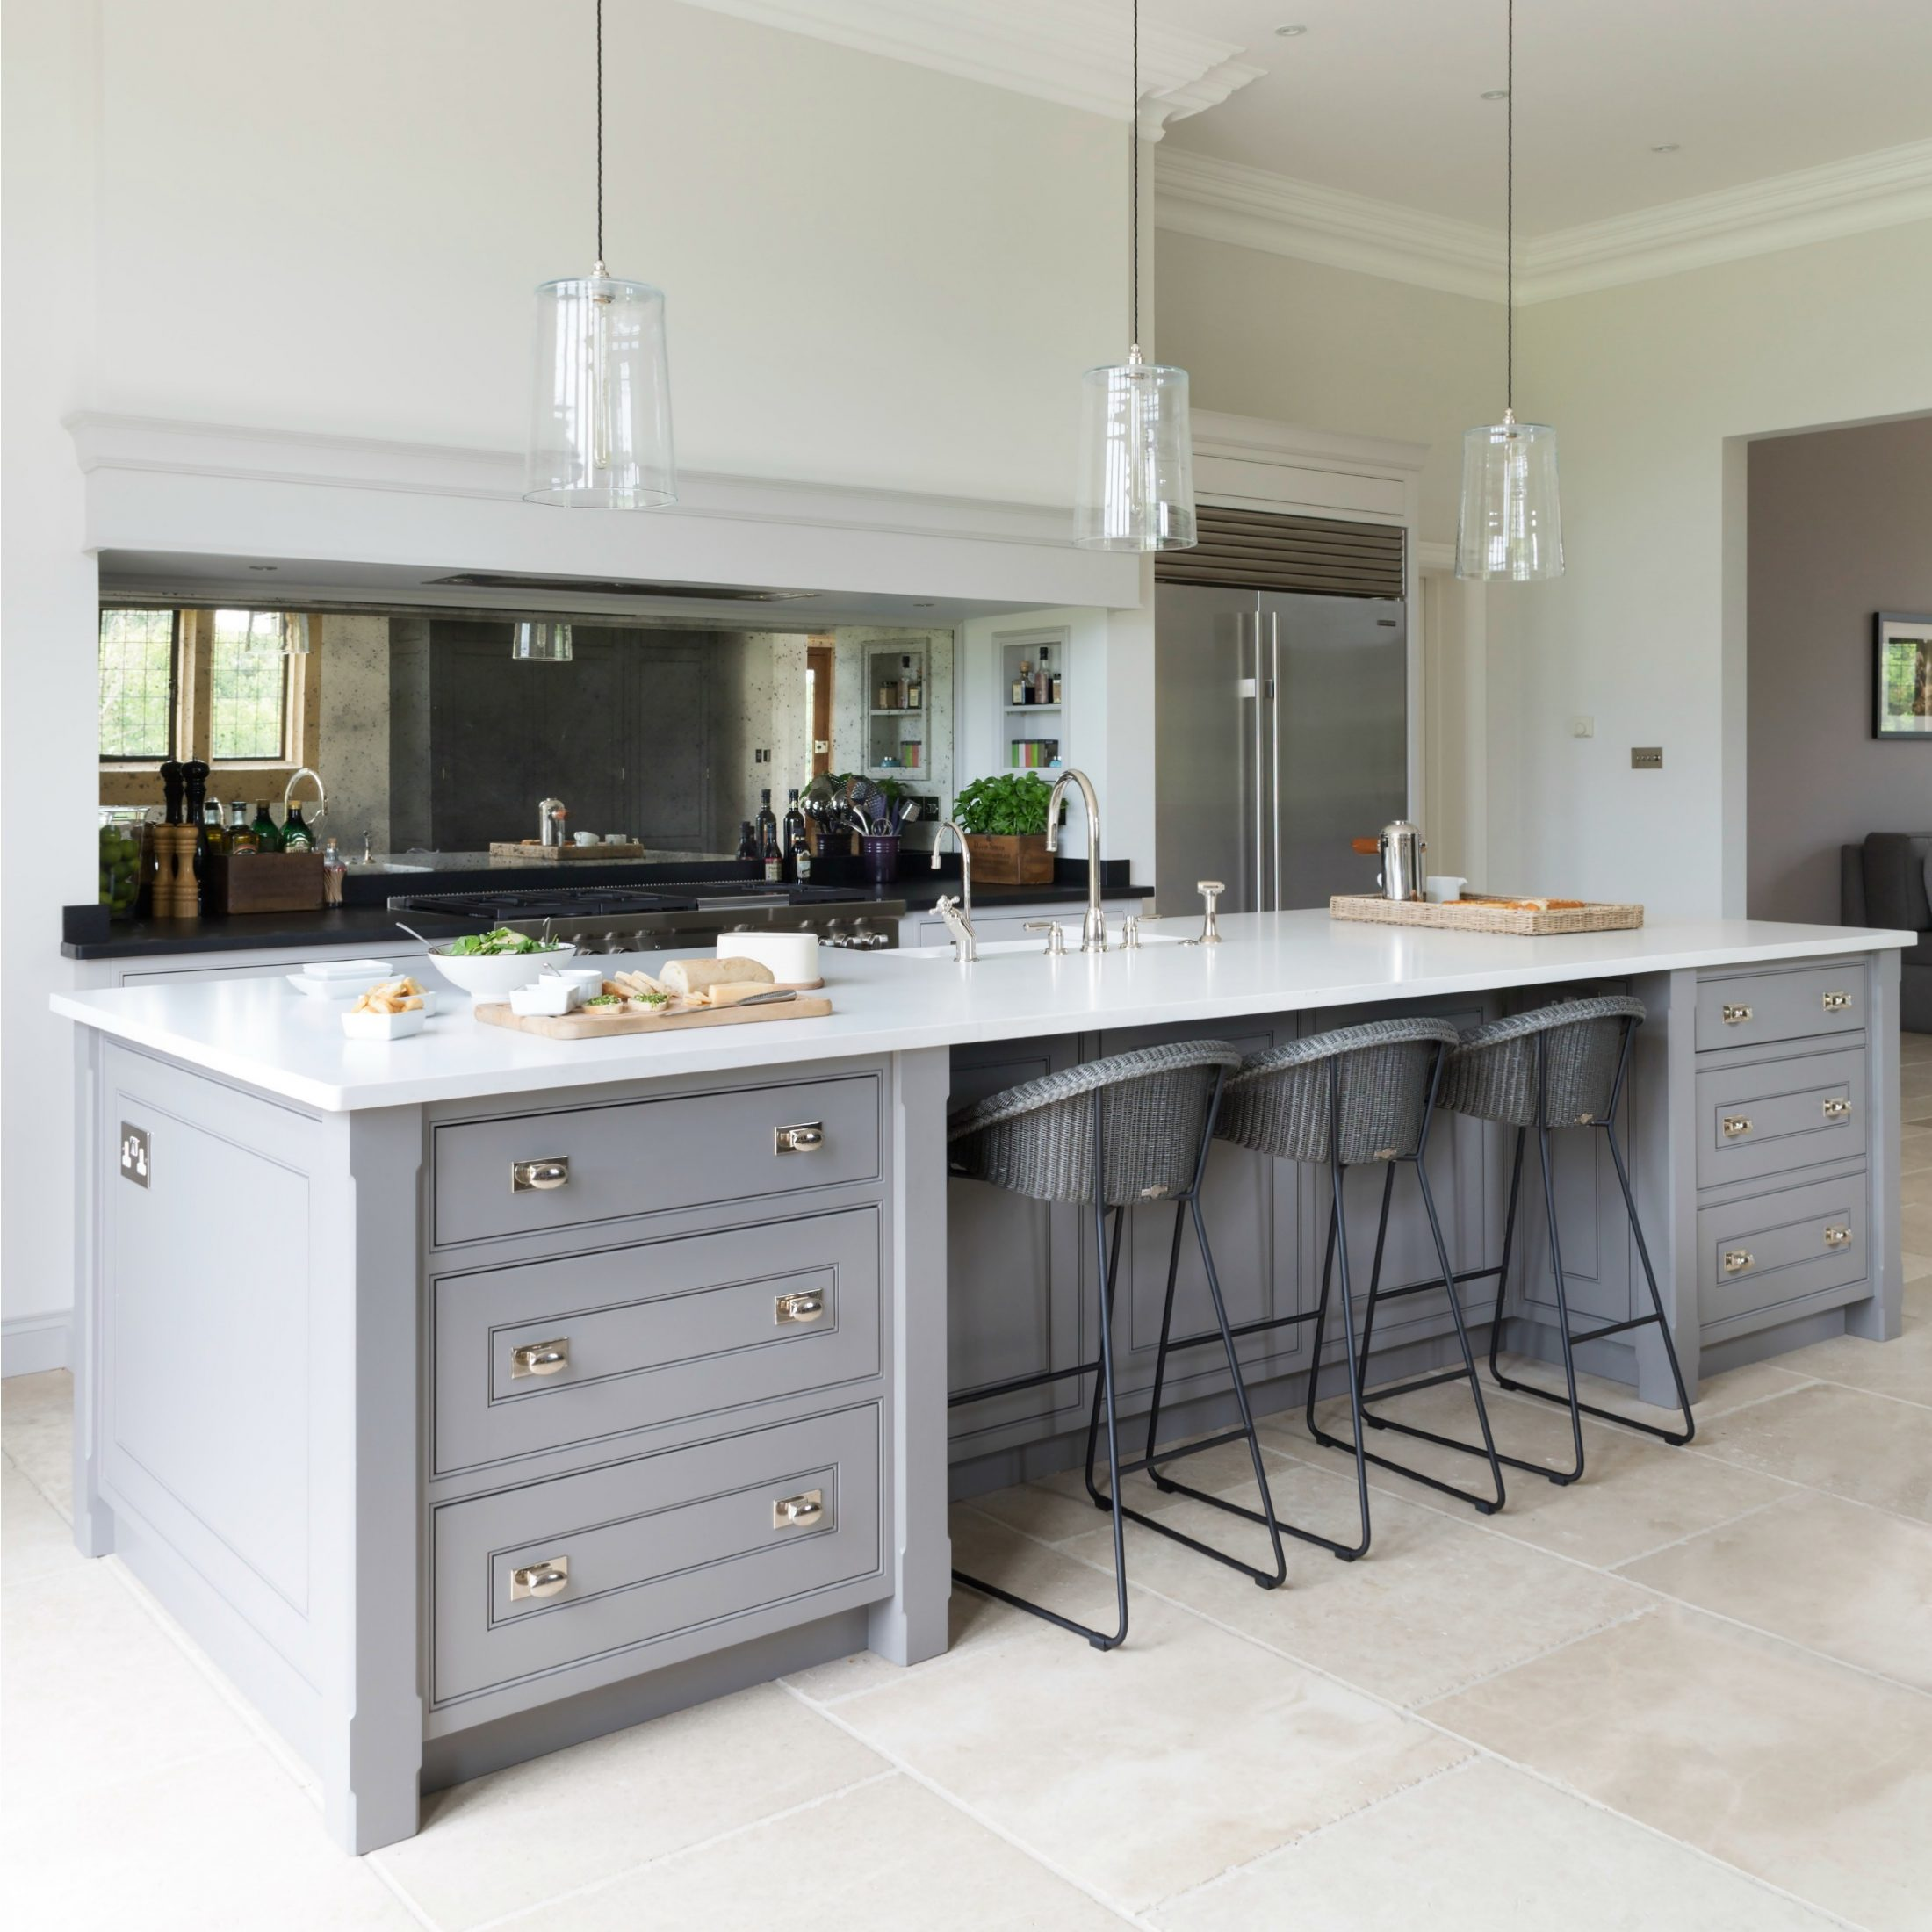 The Grange, Ascot Berkshire - Luxury Bespoke Kitchen - Humphrey Munson